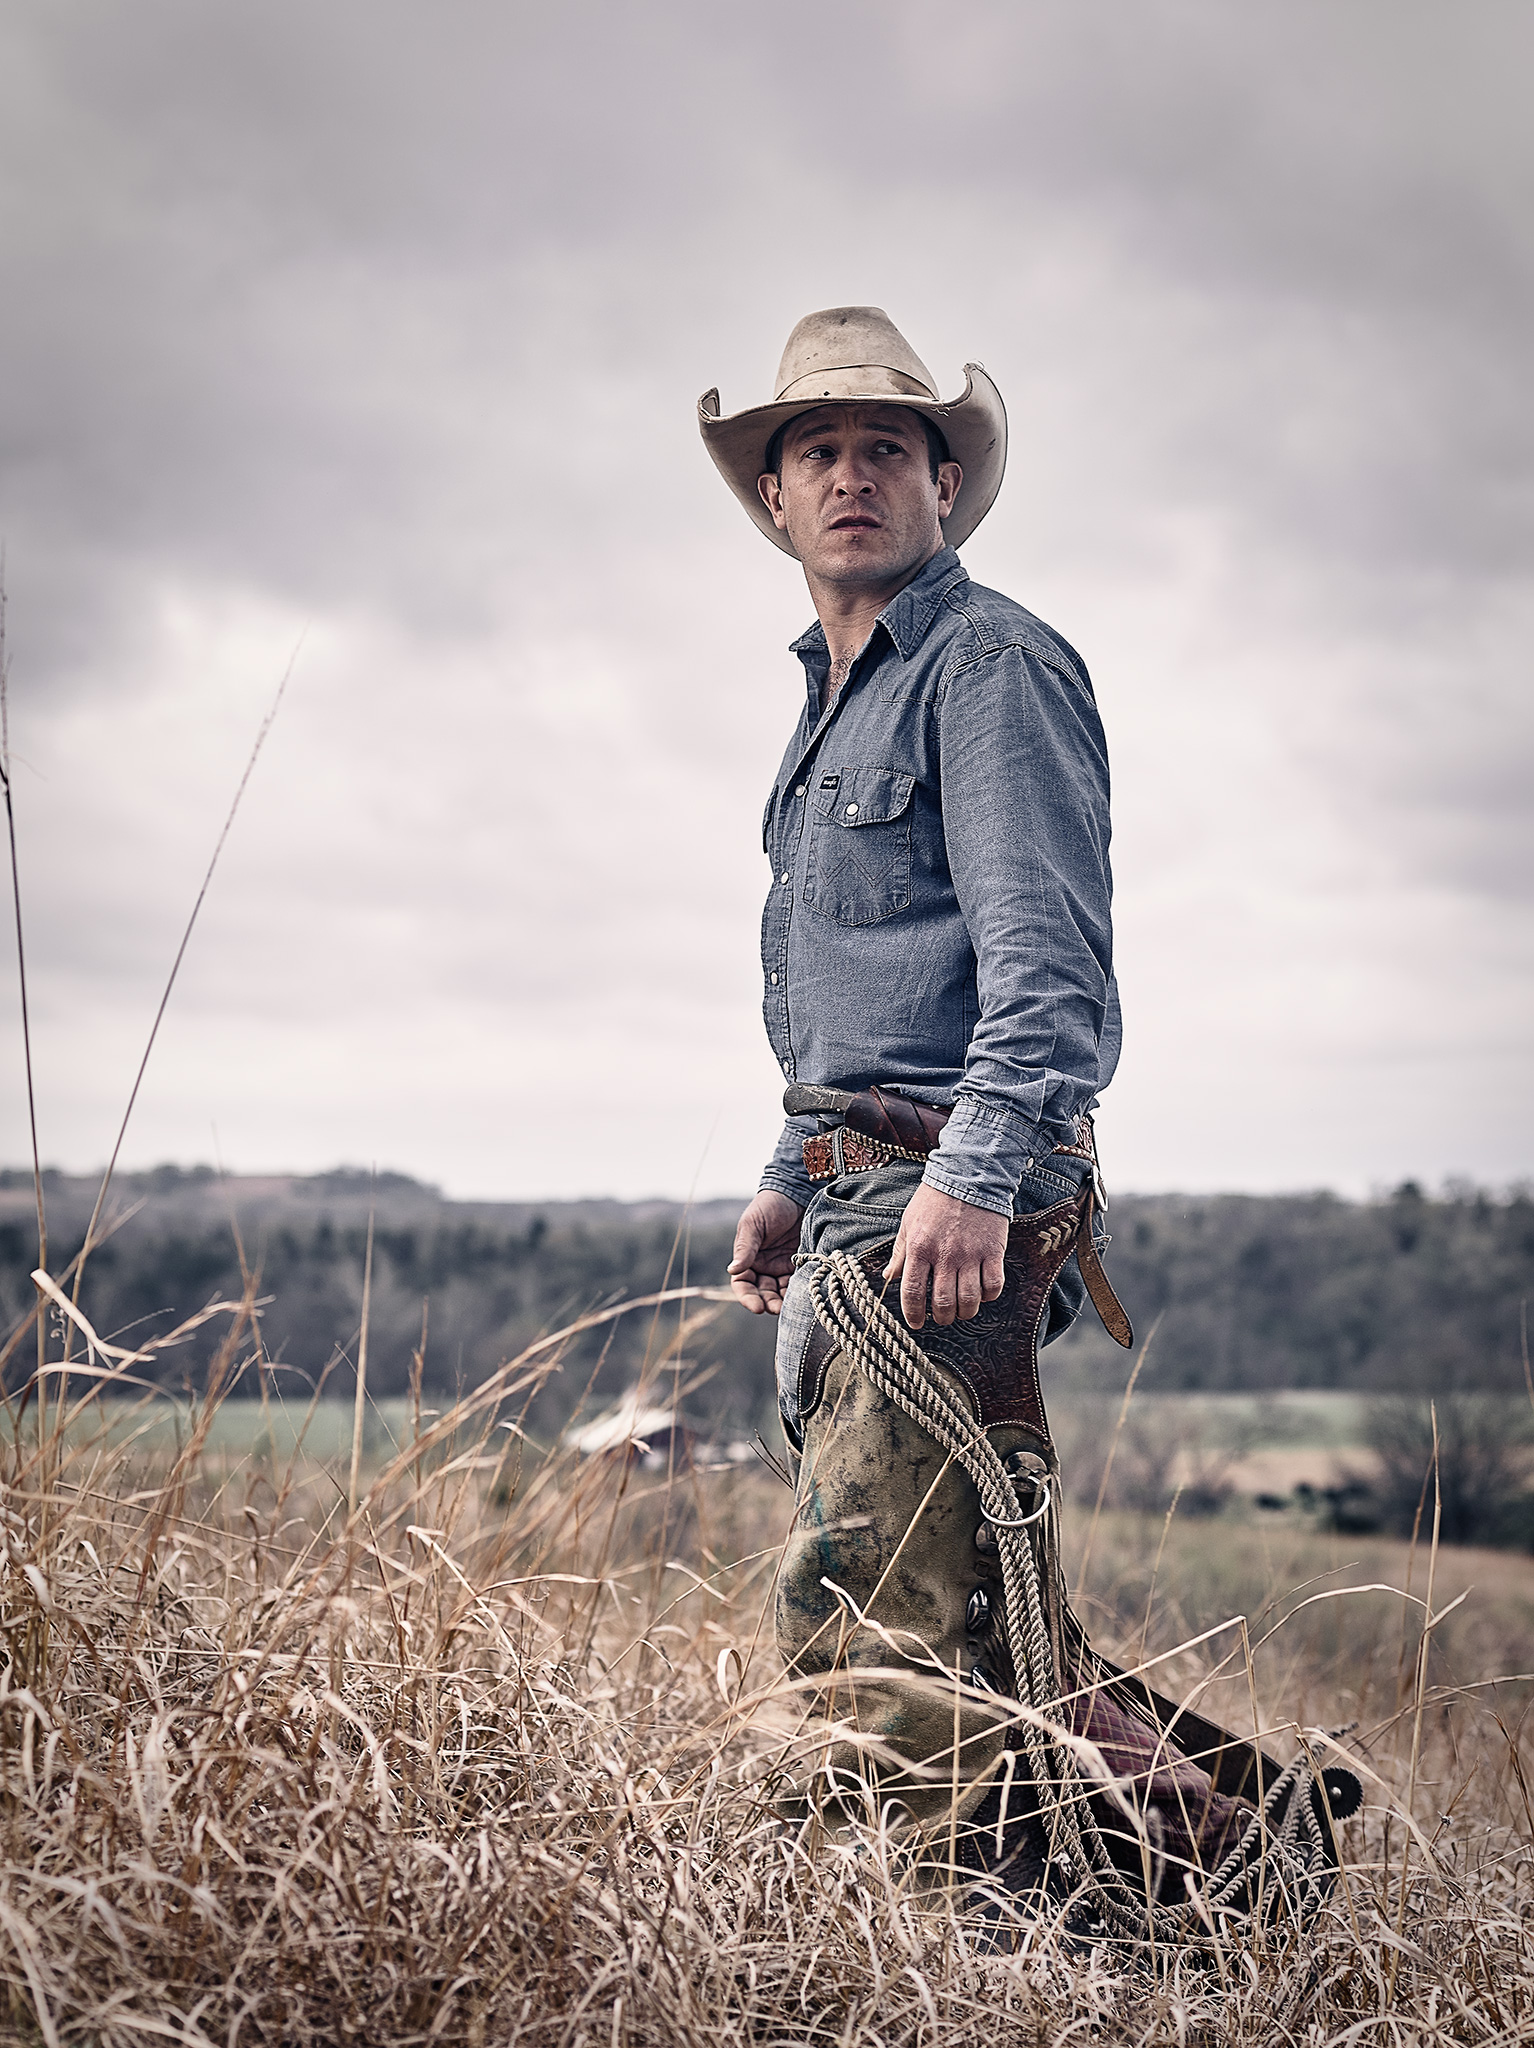 A Flint Hills cowboy walking through a pasture in the Fall.